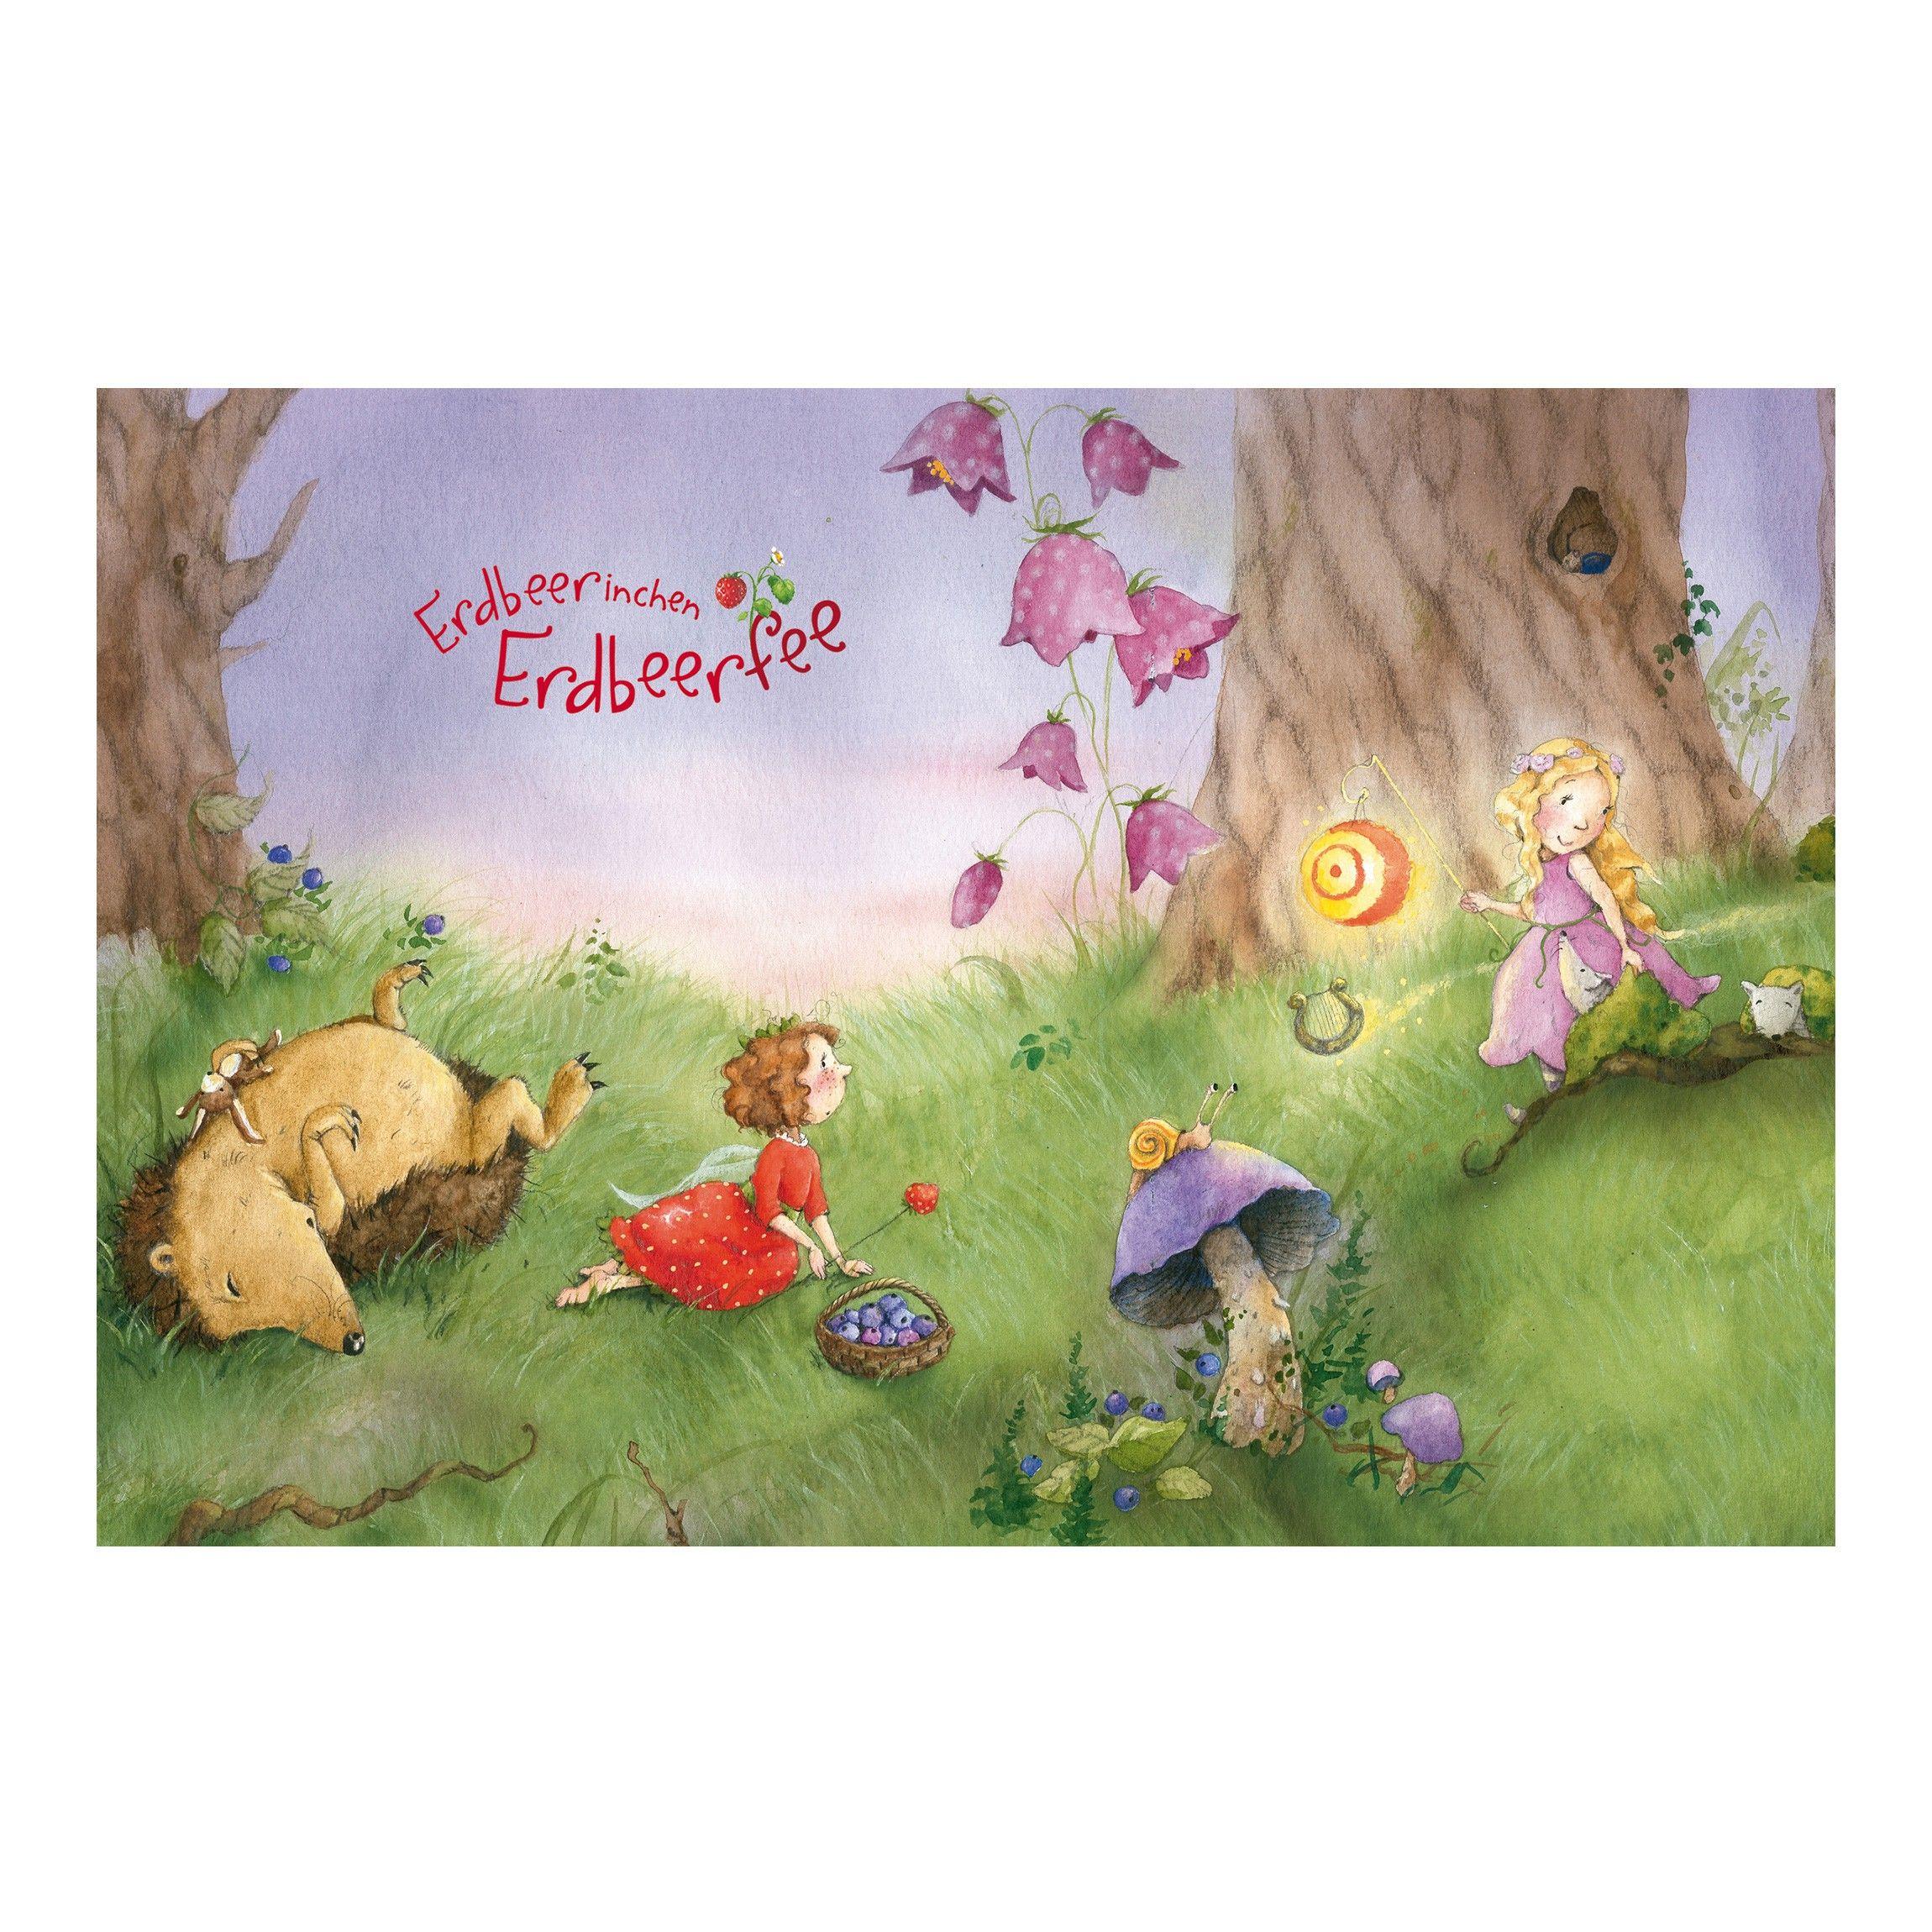 kindertapete erdbeerinchen erdbeerfee im wald vlies fototapete premium breit. Black Bedroom Furniture Sets. Home Design Ideas